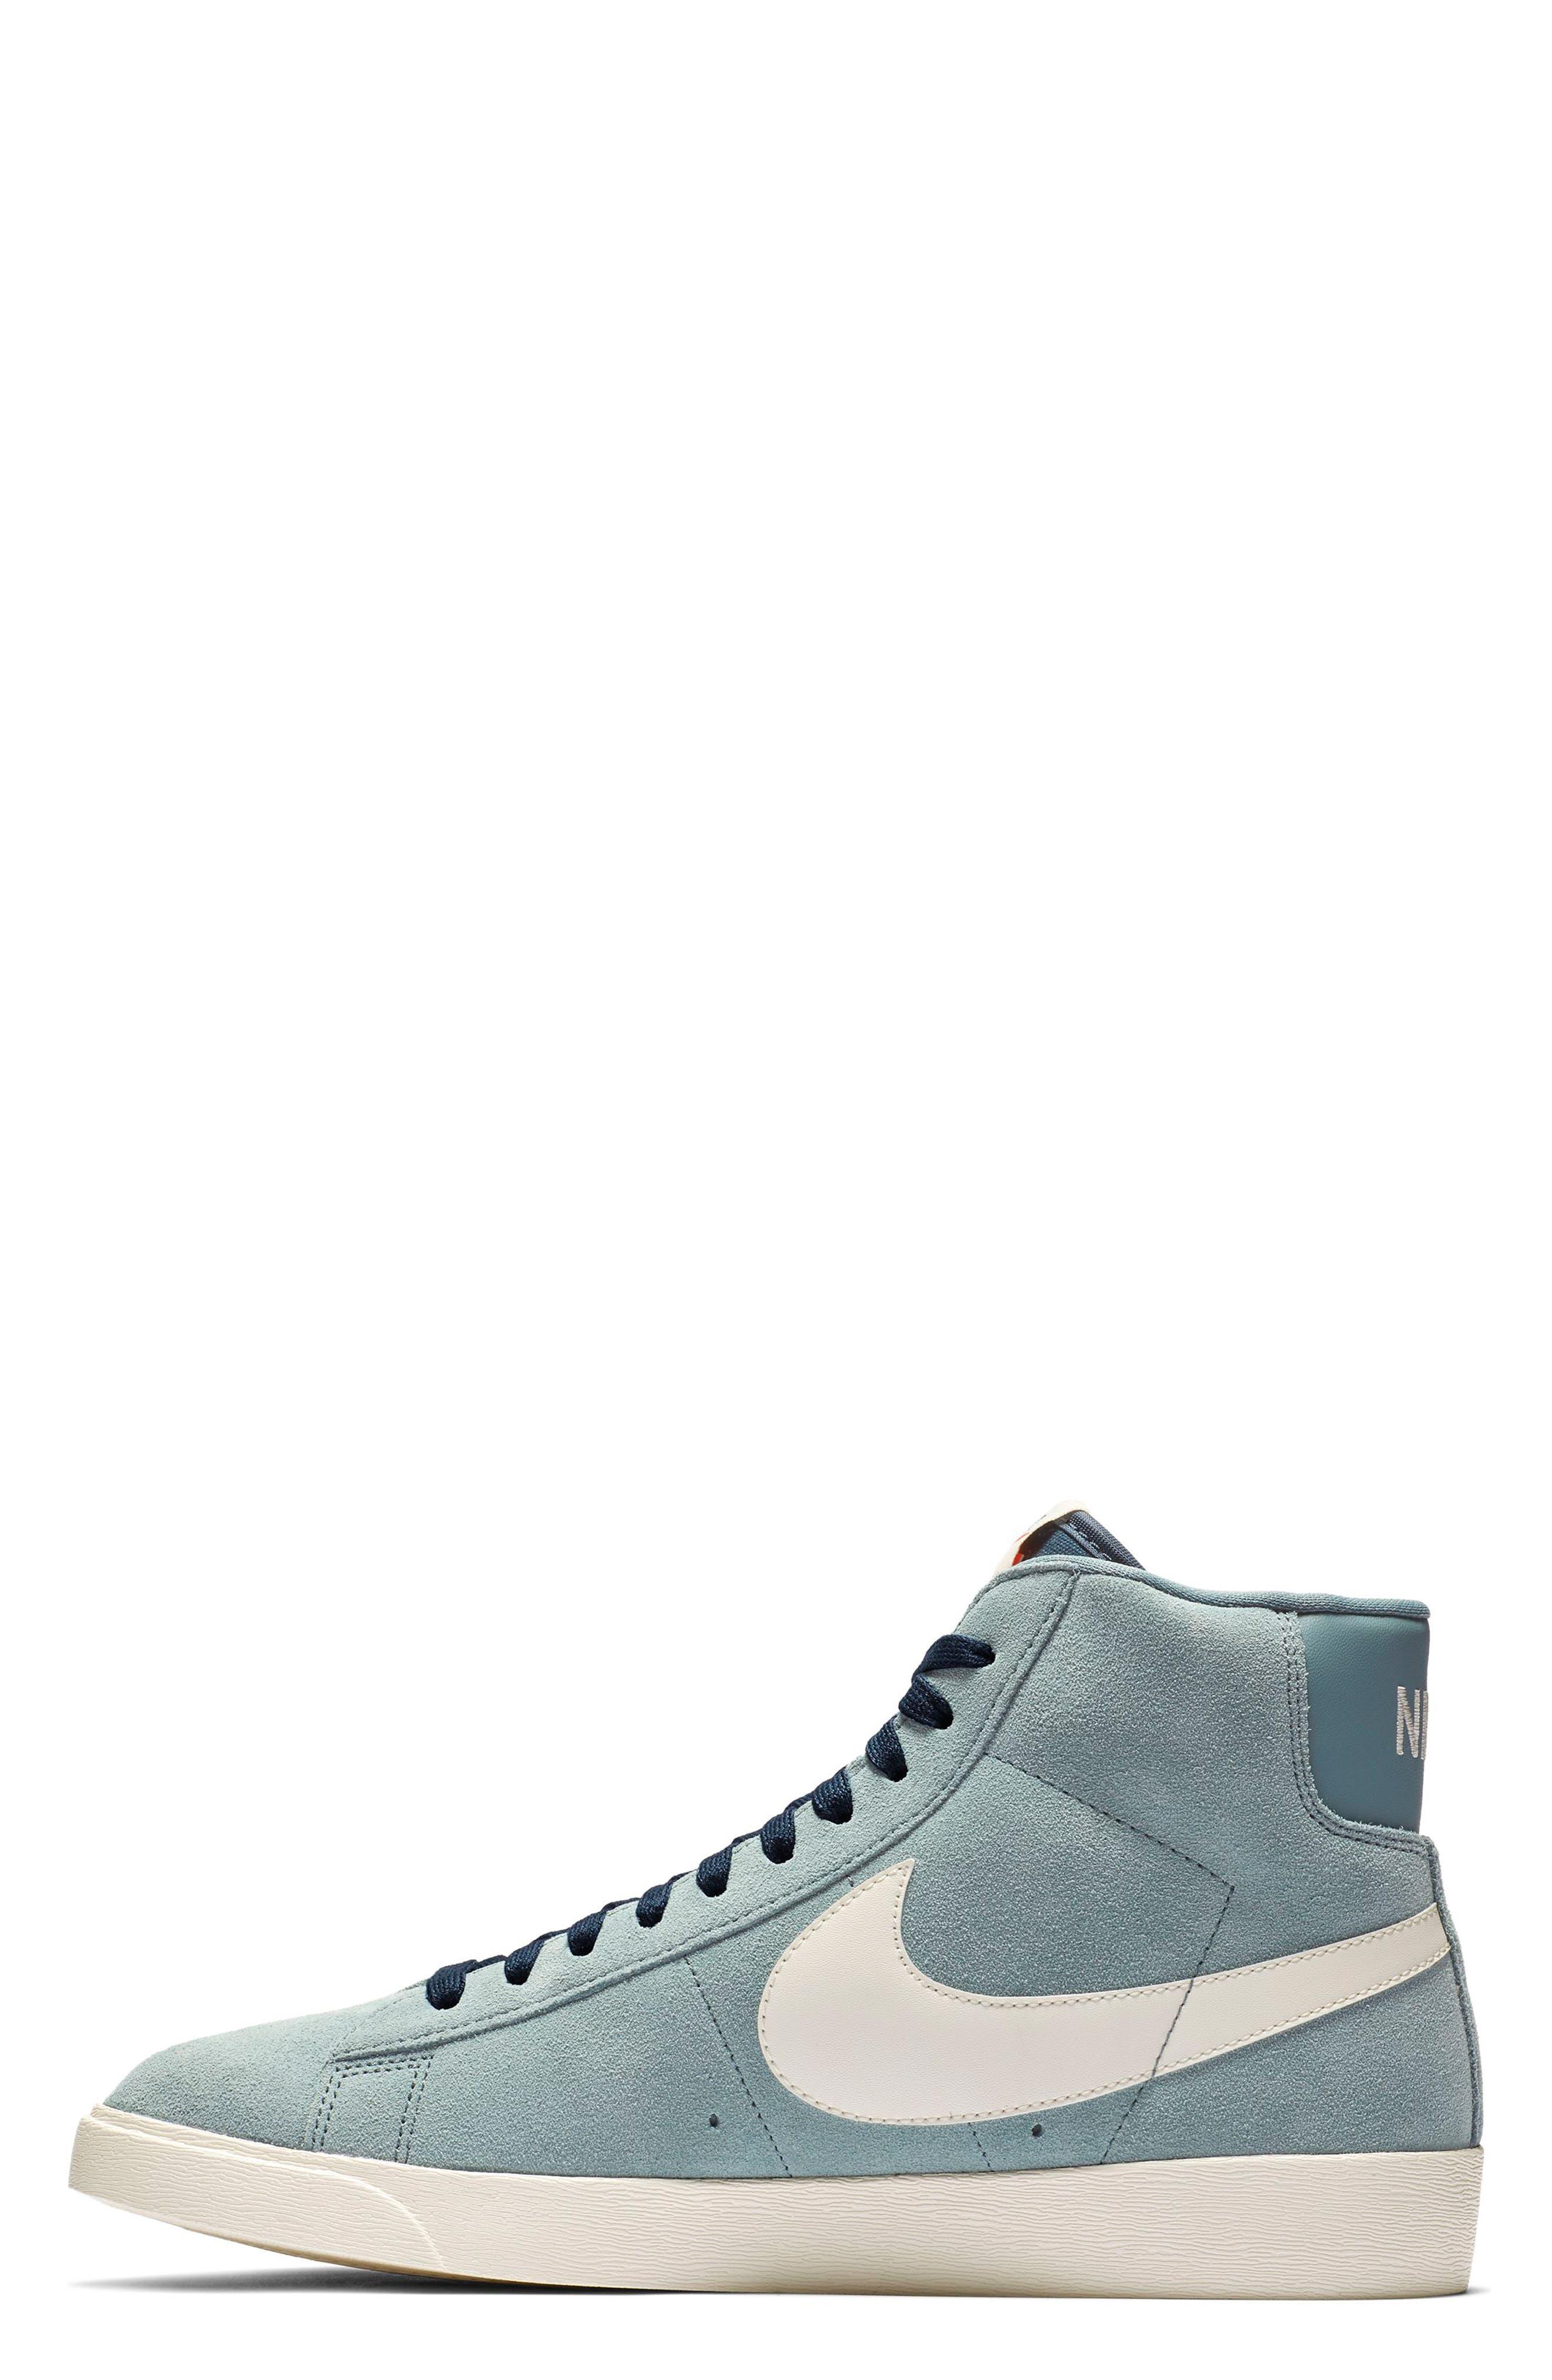 NIKE, Blazer Mid Vintage Sneaker, Alternate thumbnail 3, color, AVIATOR GREY/ SAIL/ BLUE